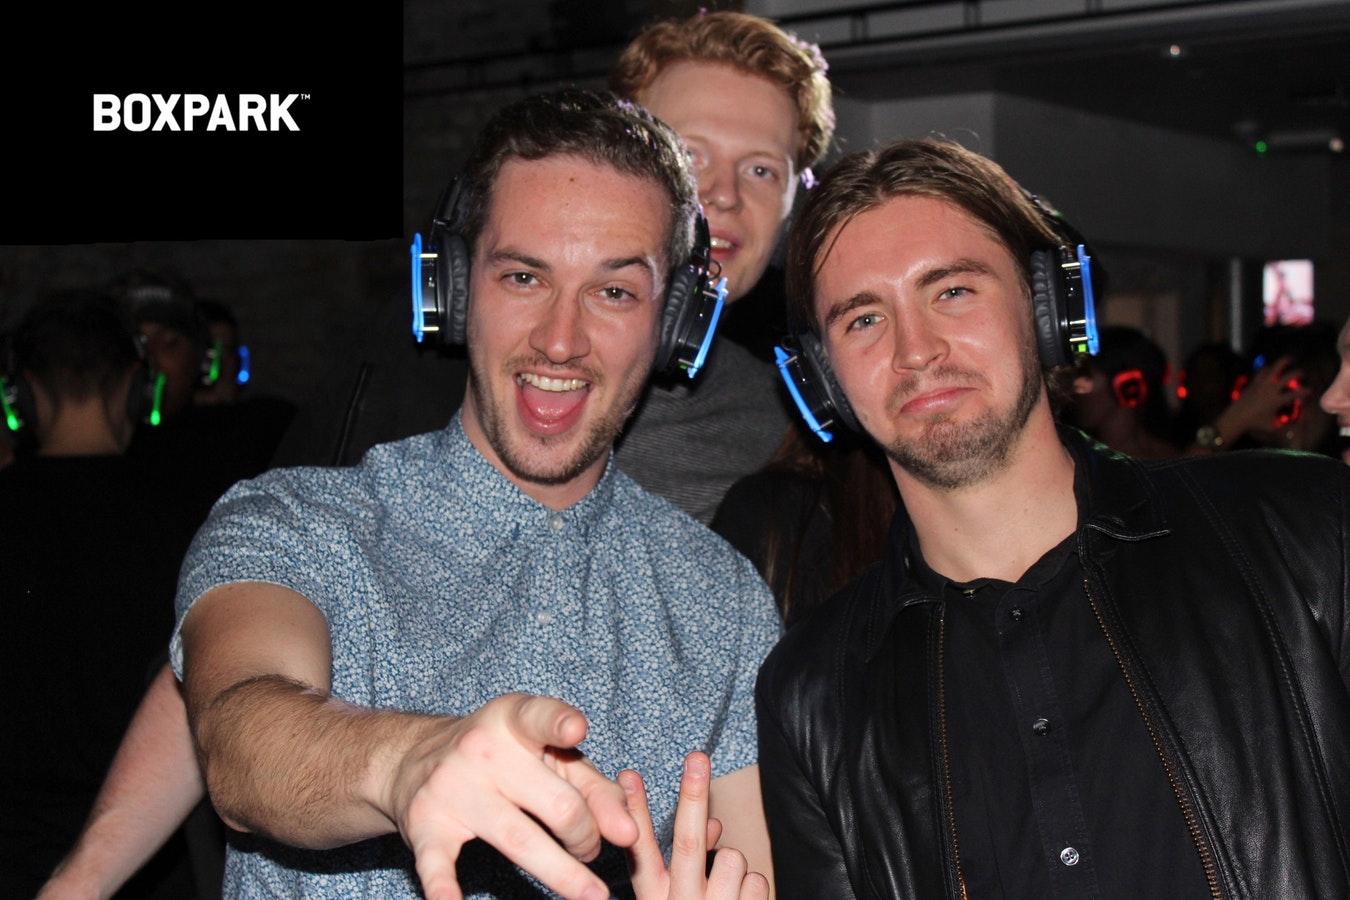 FREE Headphone Party @Boxpark Shoreditch